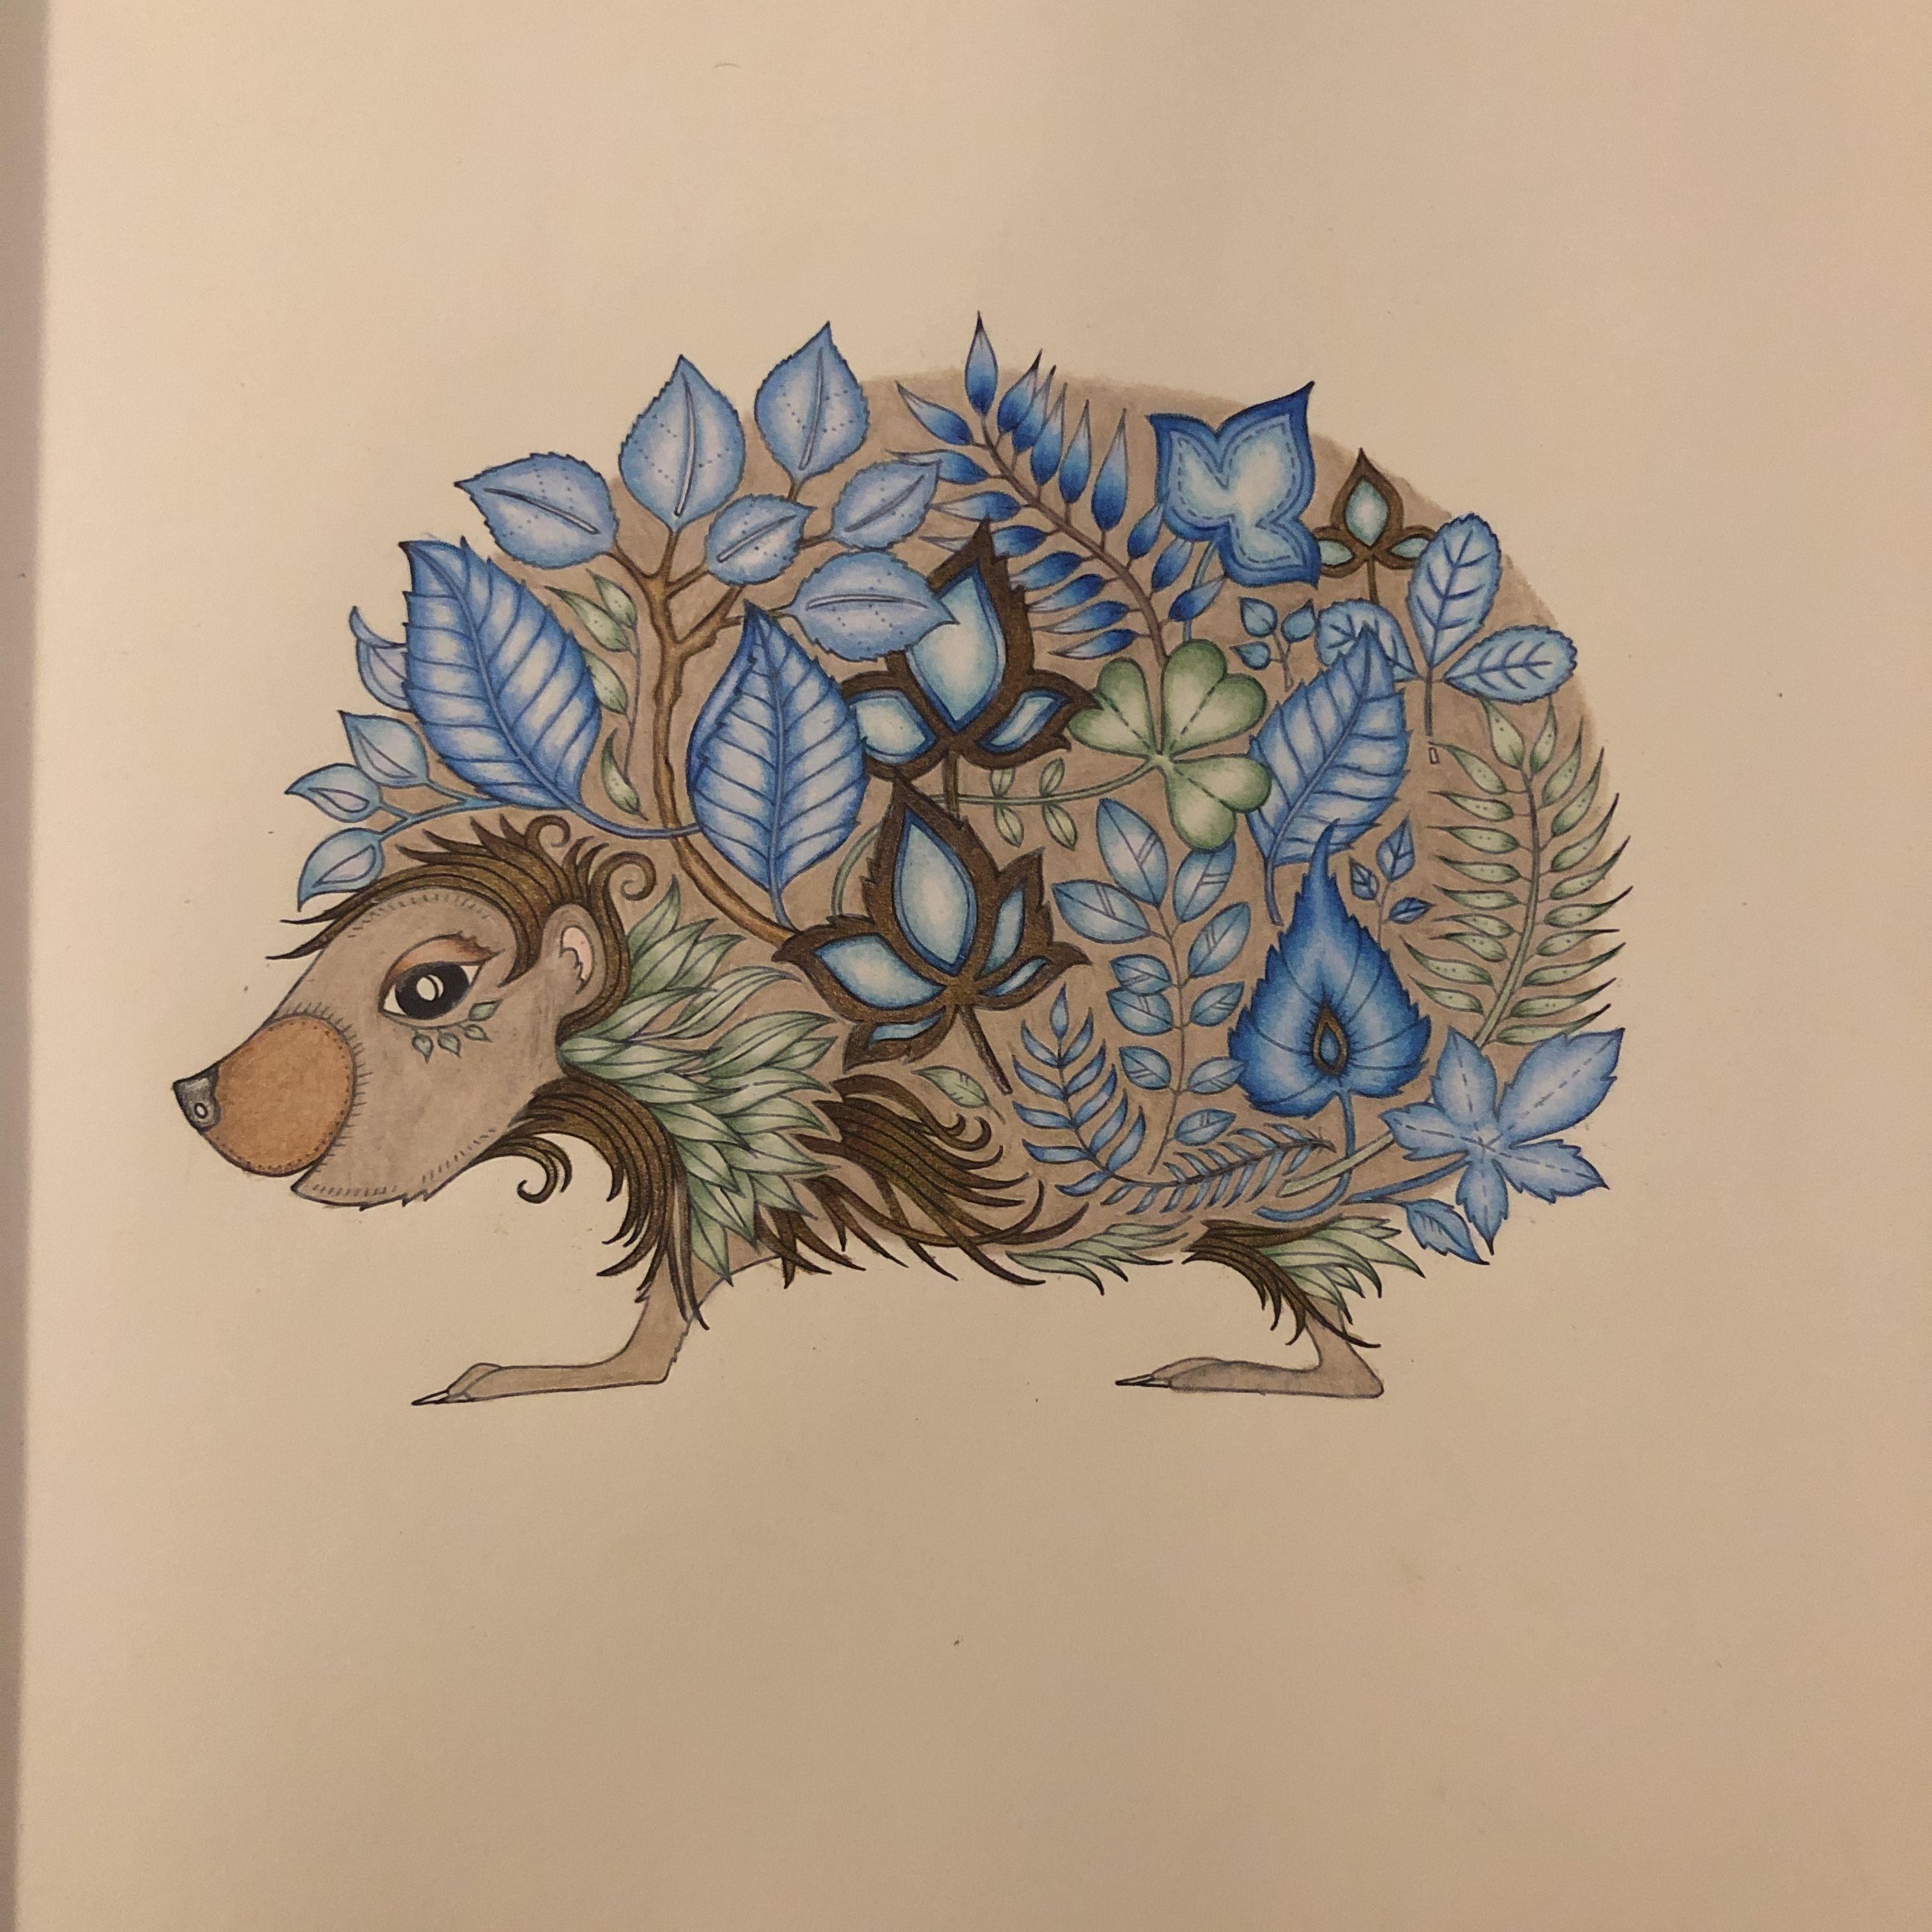 Sonic The Enchanted Hedgehog Johanna Basford Enchanted Forest Enchanted Forest Coloring Book Basford Enchanted Forest